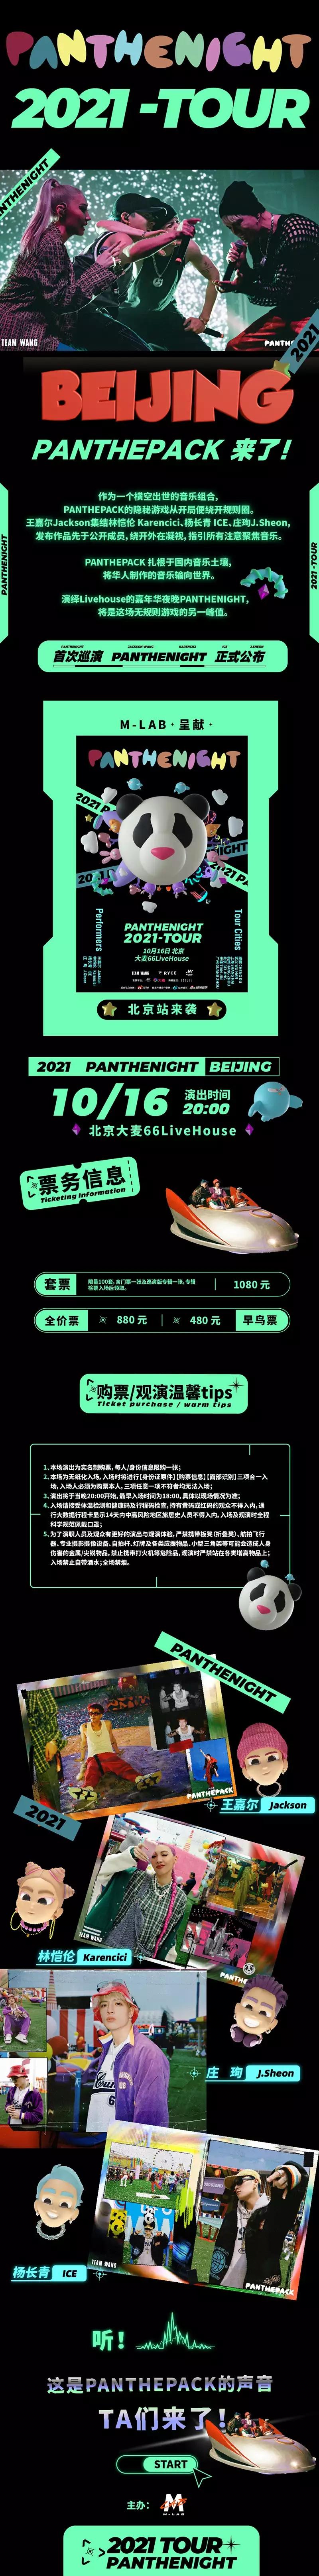 2021M-LAB呈献|PANTHEPACK全国巡演-PANTHENIGHT-北京站